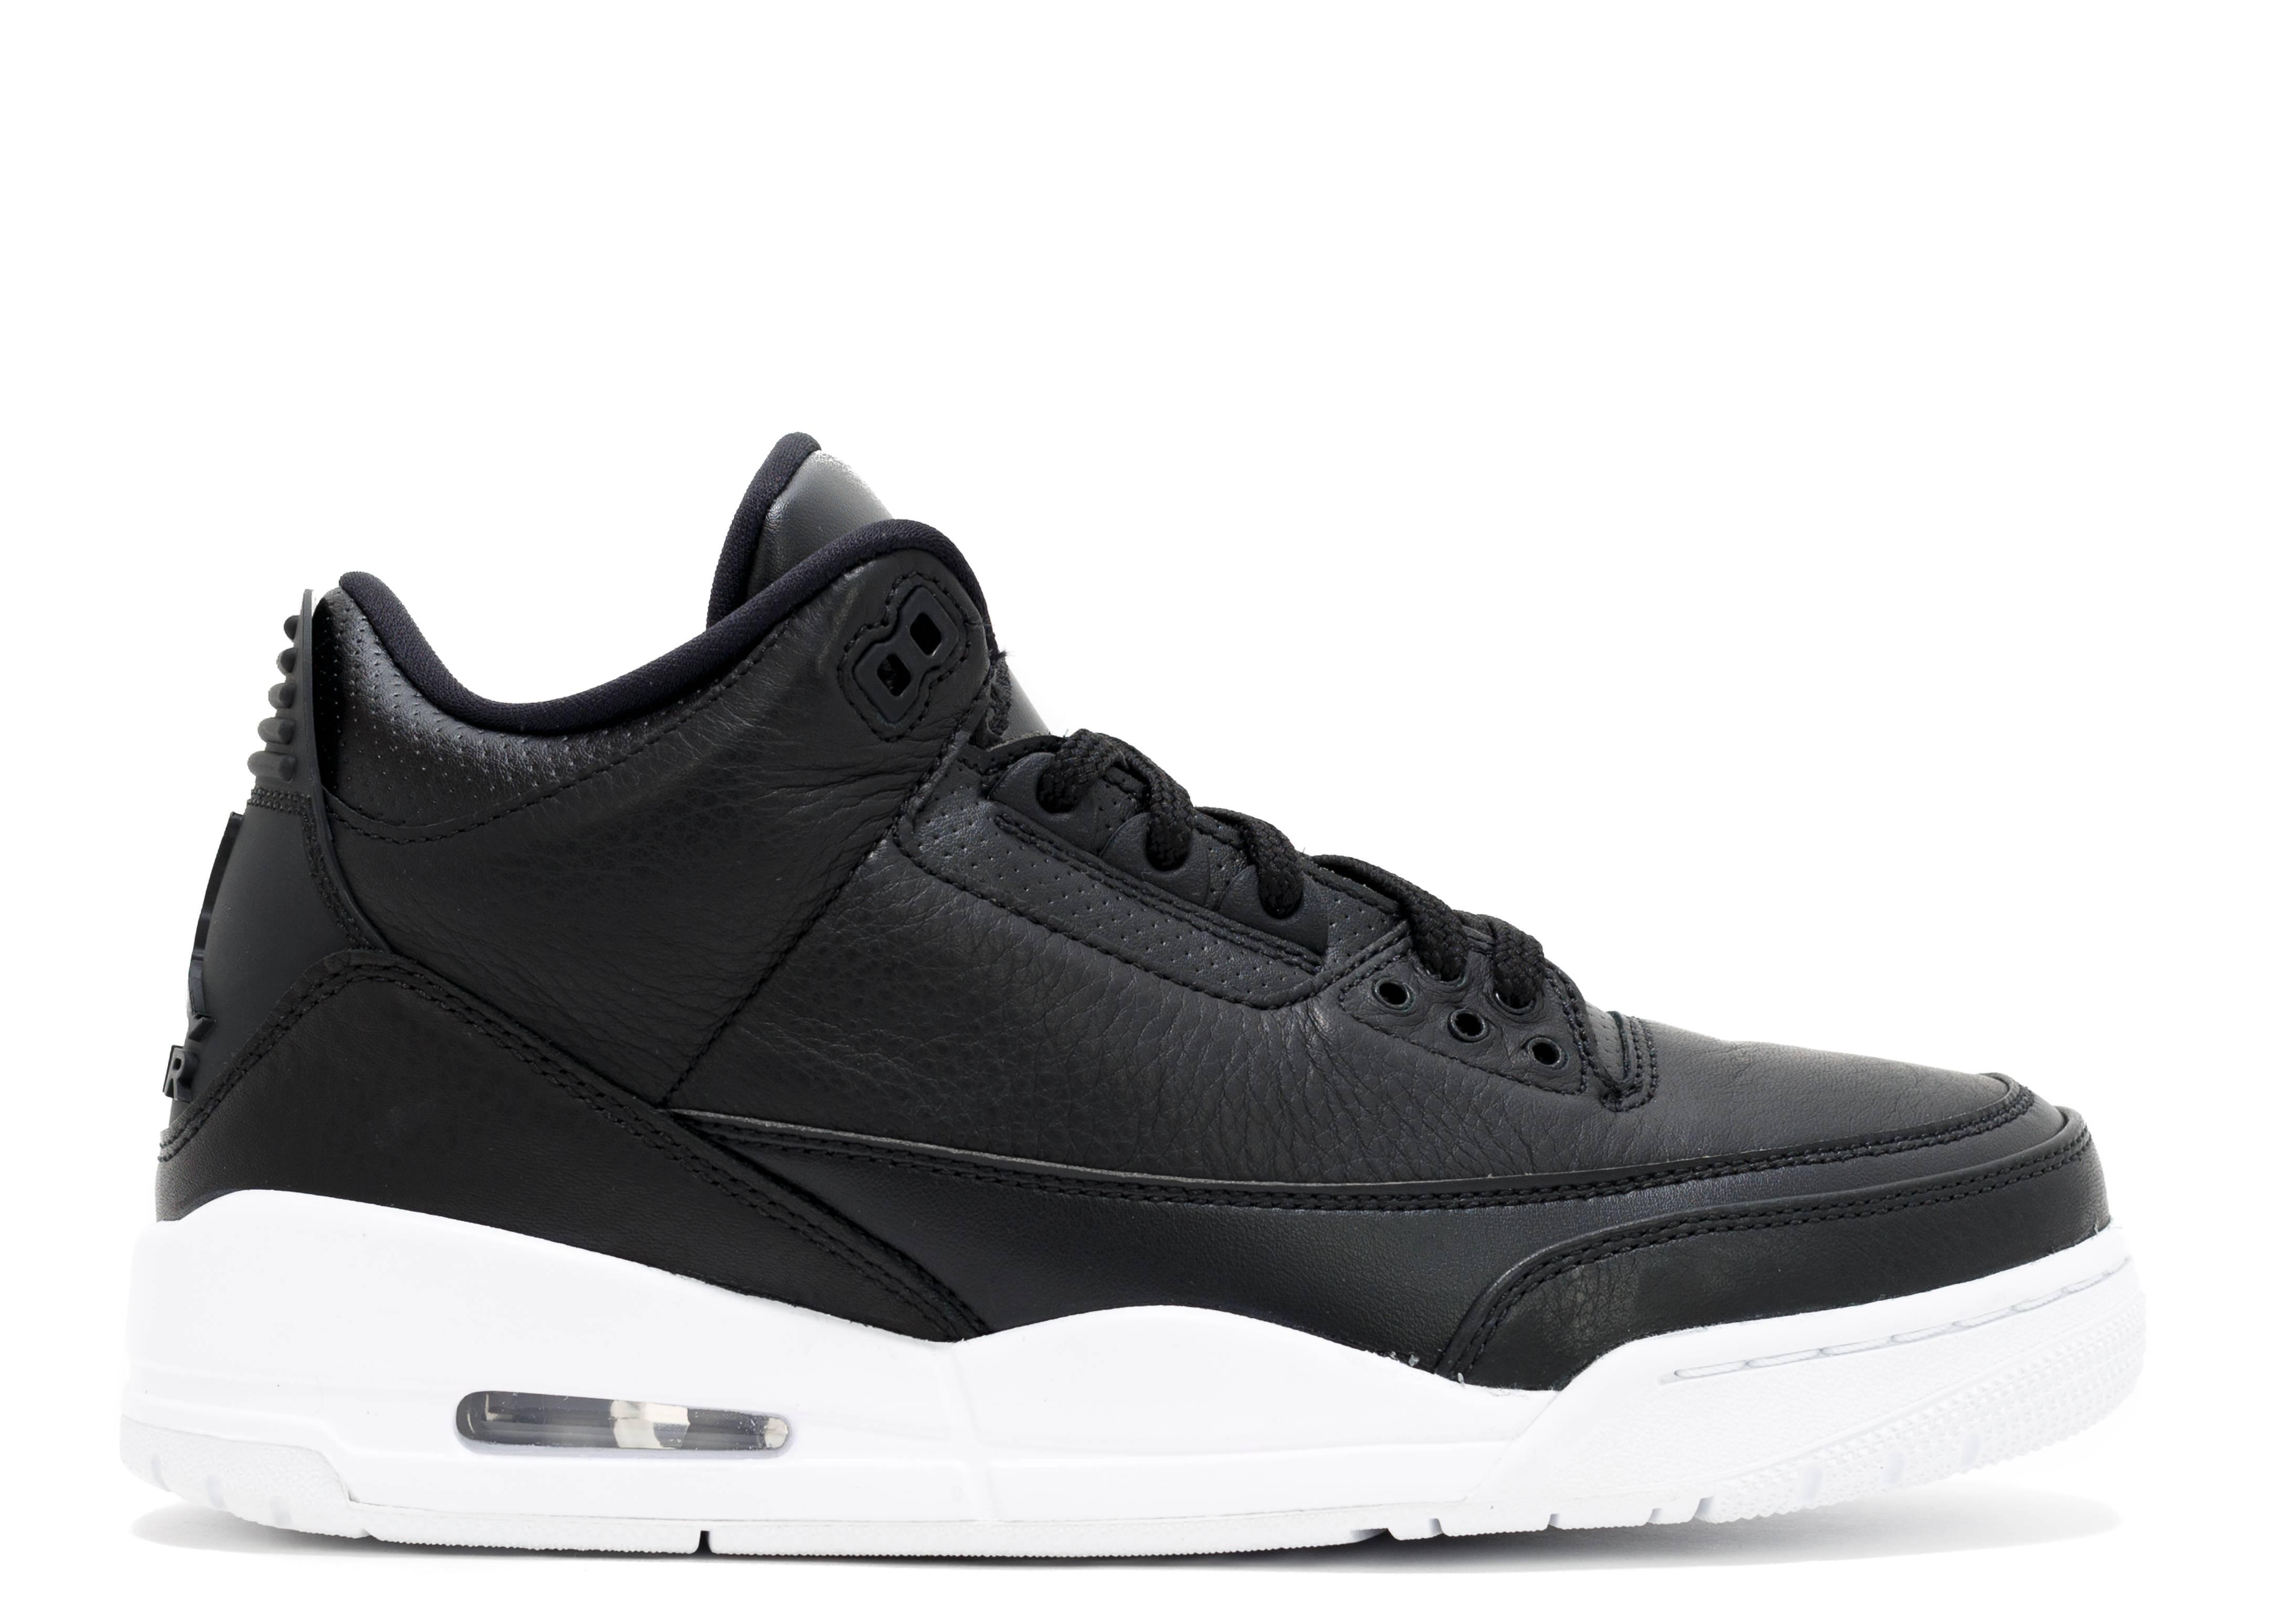 finest selection 30685 fdba9 Air Jordan 3 Retro